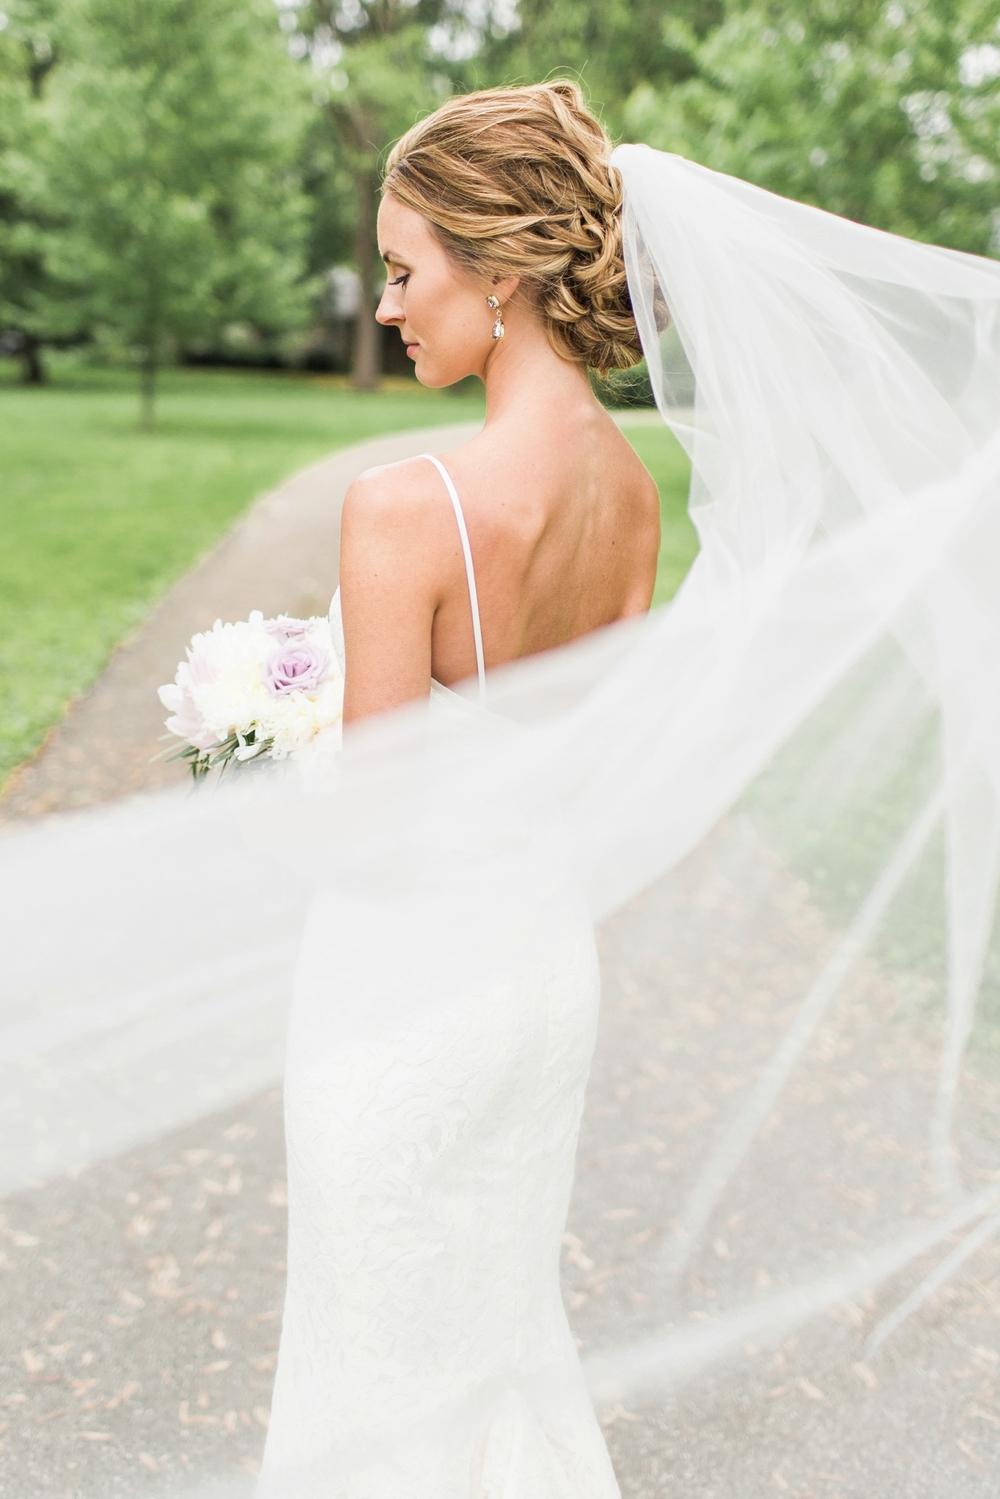 St_Joan_of_Arc_Indianapolis_Sahms_Atrium_Indiana_Wedding_Photography_Chloe_Luka_Photography_6578.jpg